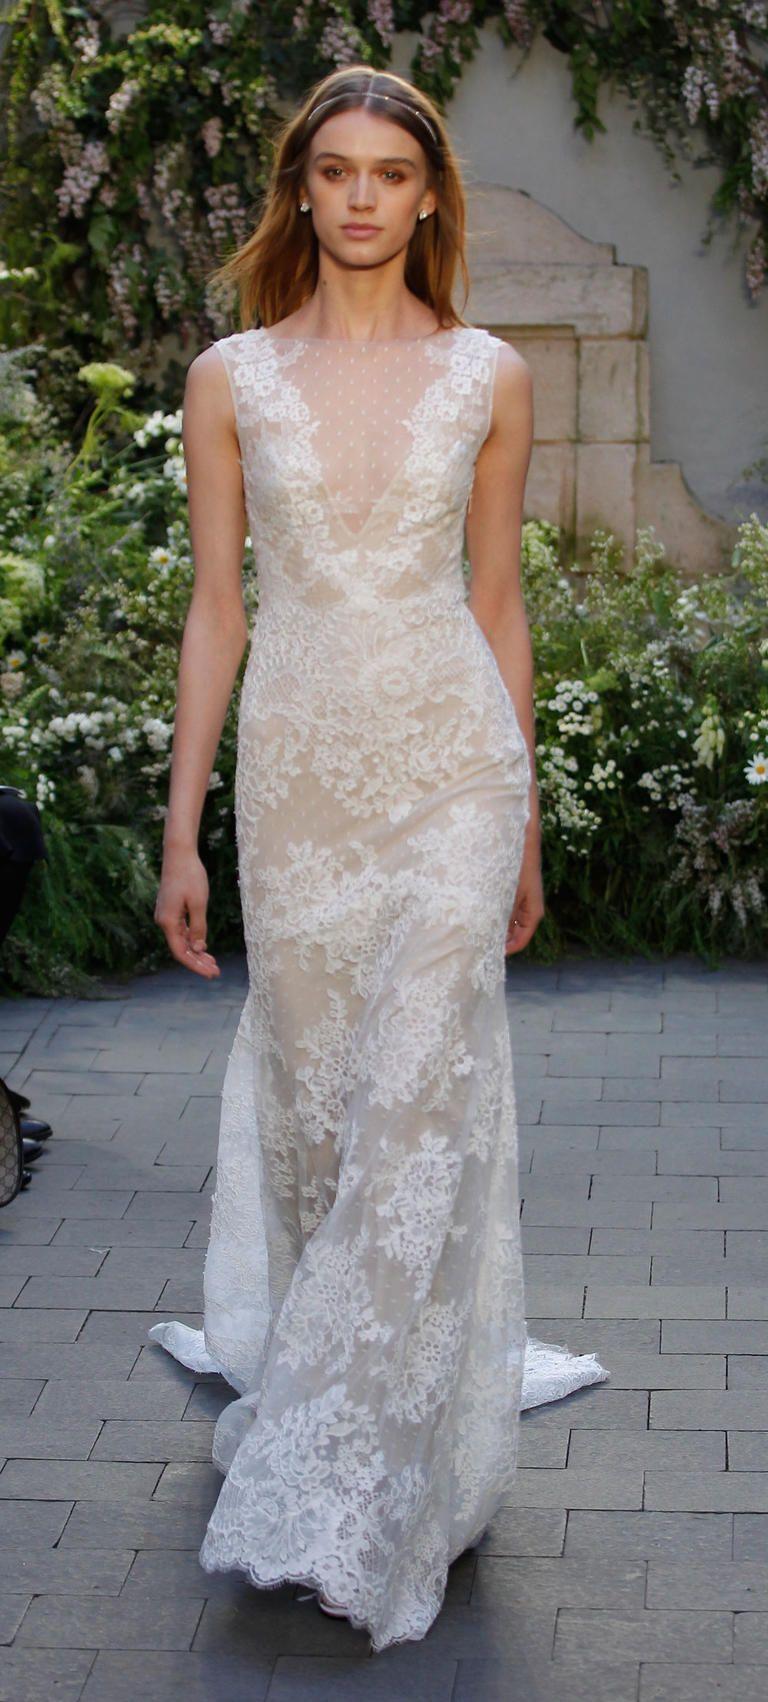 Monique lhuillier stuns with lingerie inspired wedding for Lingerie for wedding dress